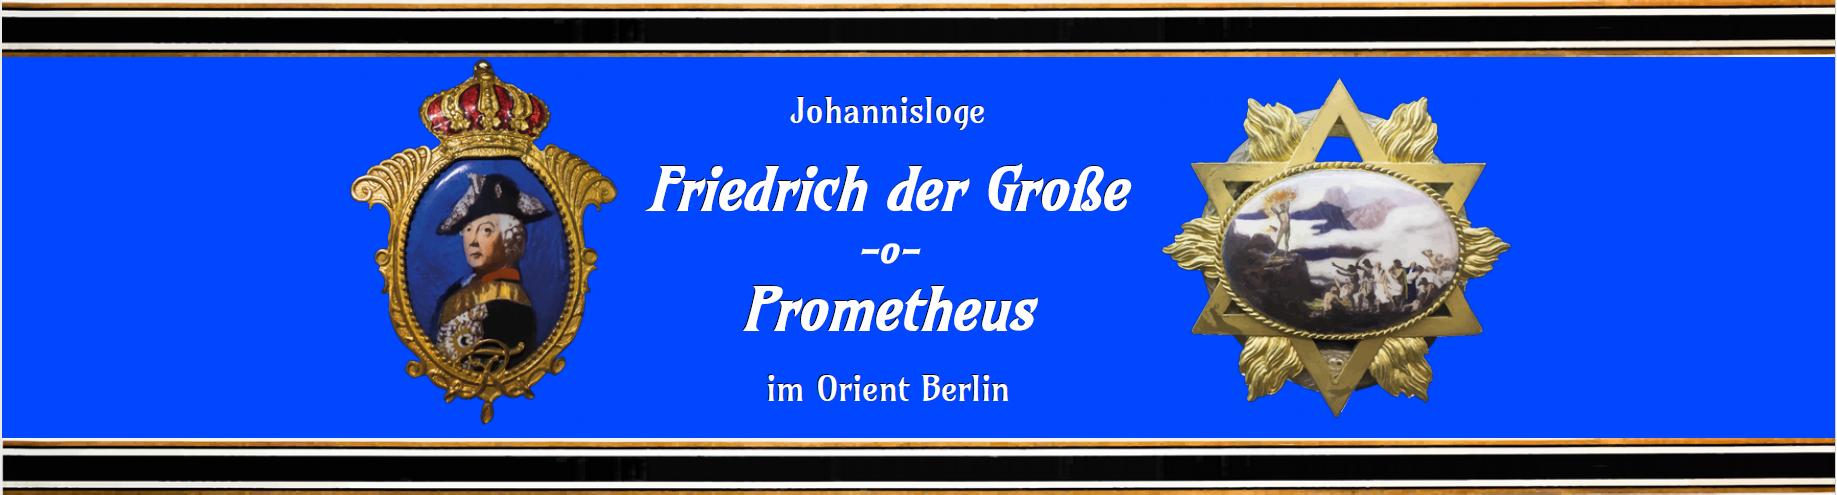 Johannisloge Friedrich der Grosse -o- Prometheus